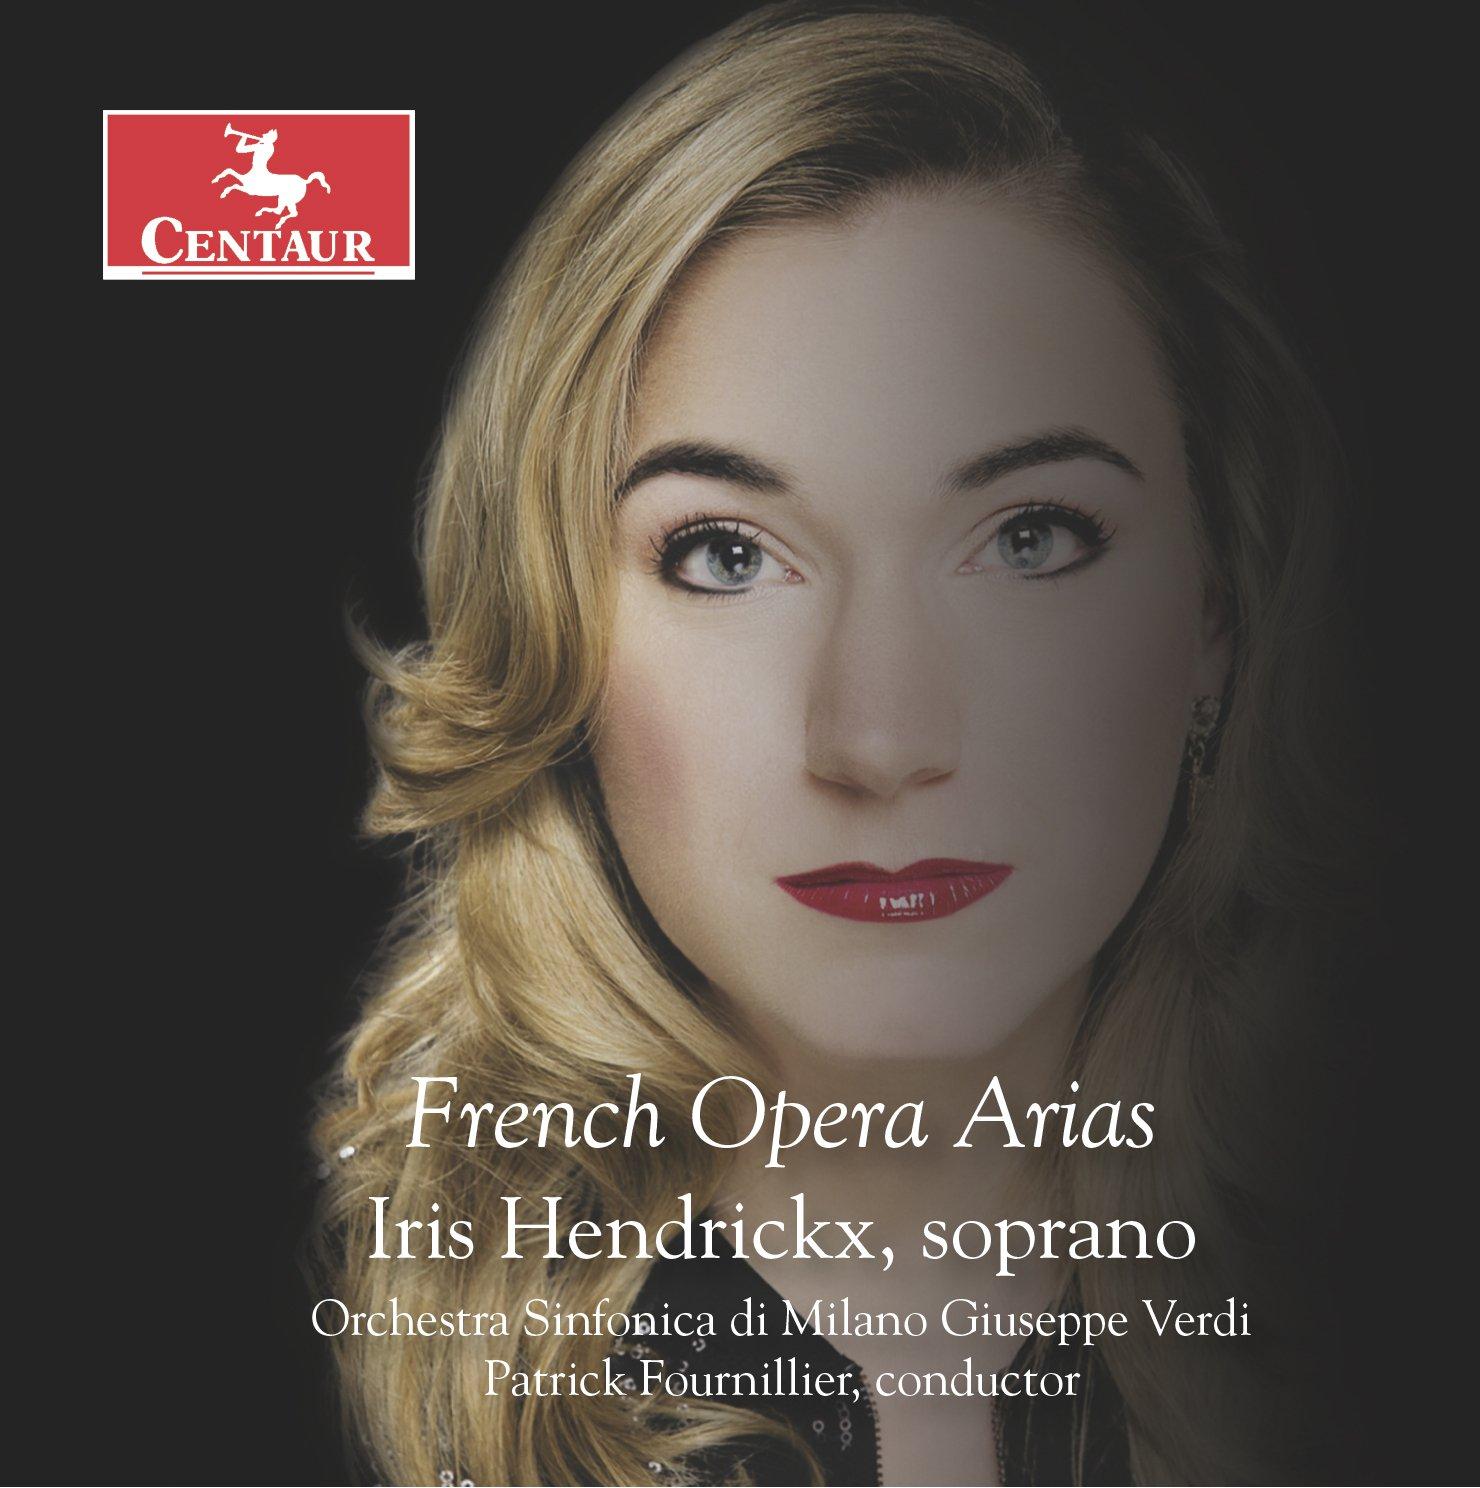 Iris Hendrickx: French Opera Arias by Centaur